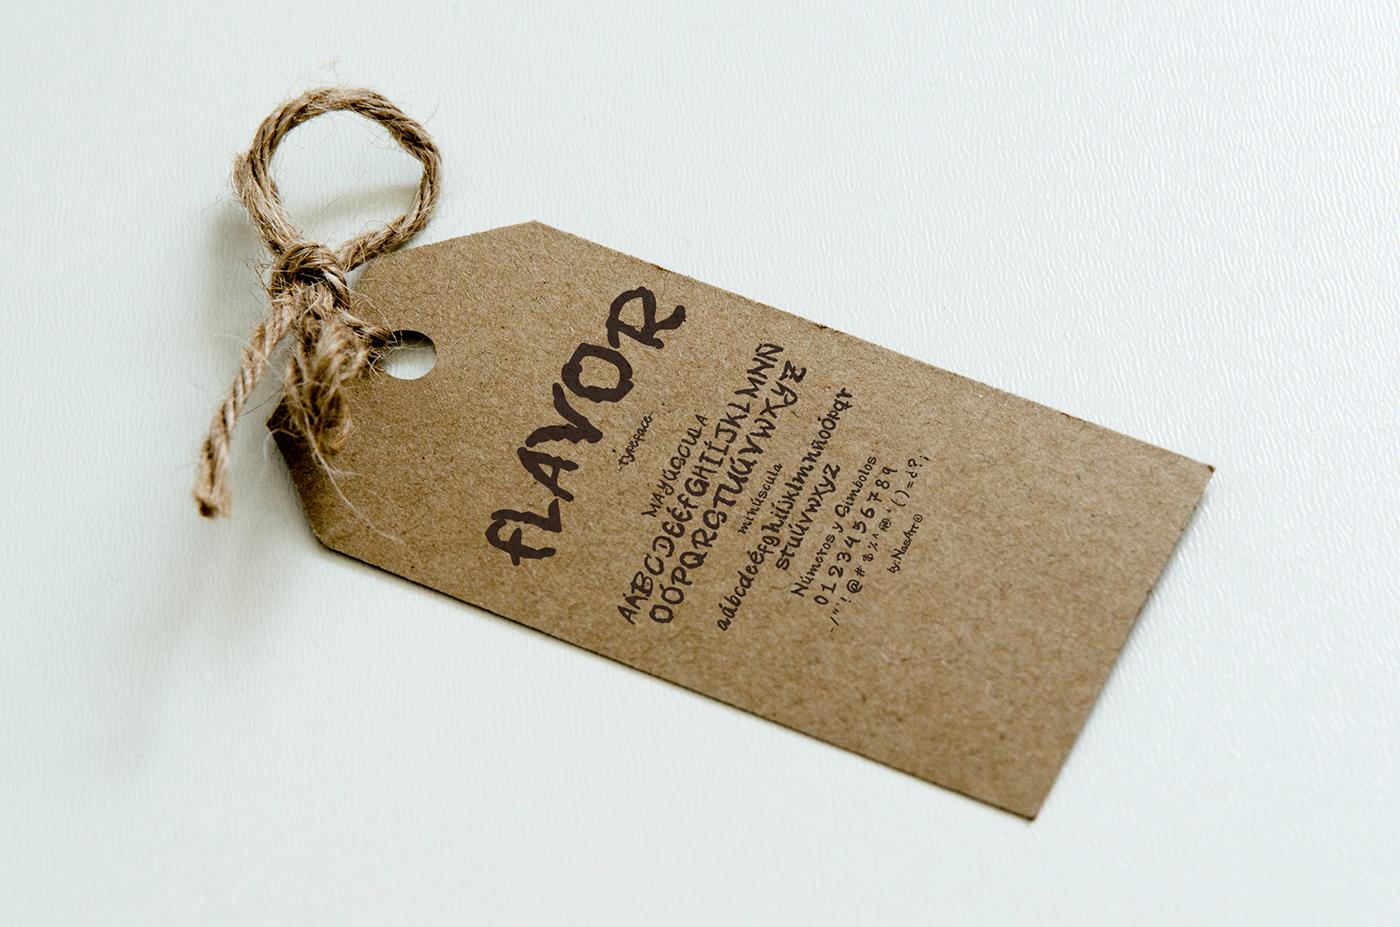 Nasser-Araujo_Flavor-handmade-type_260617_prev02